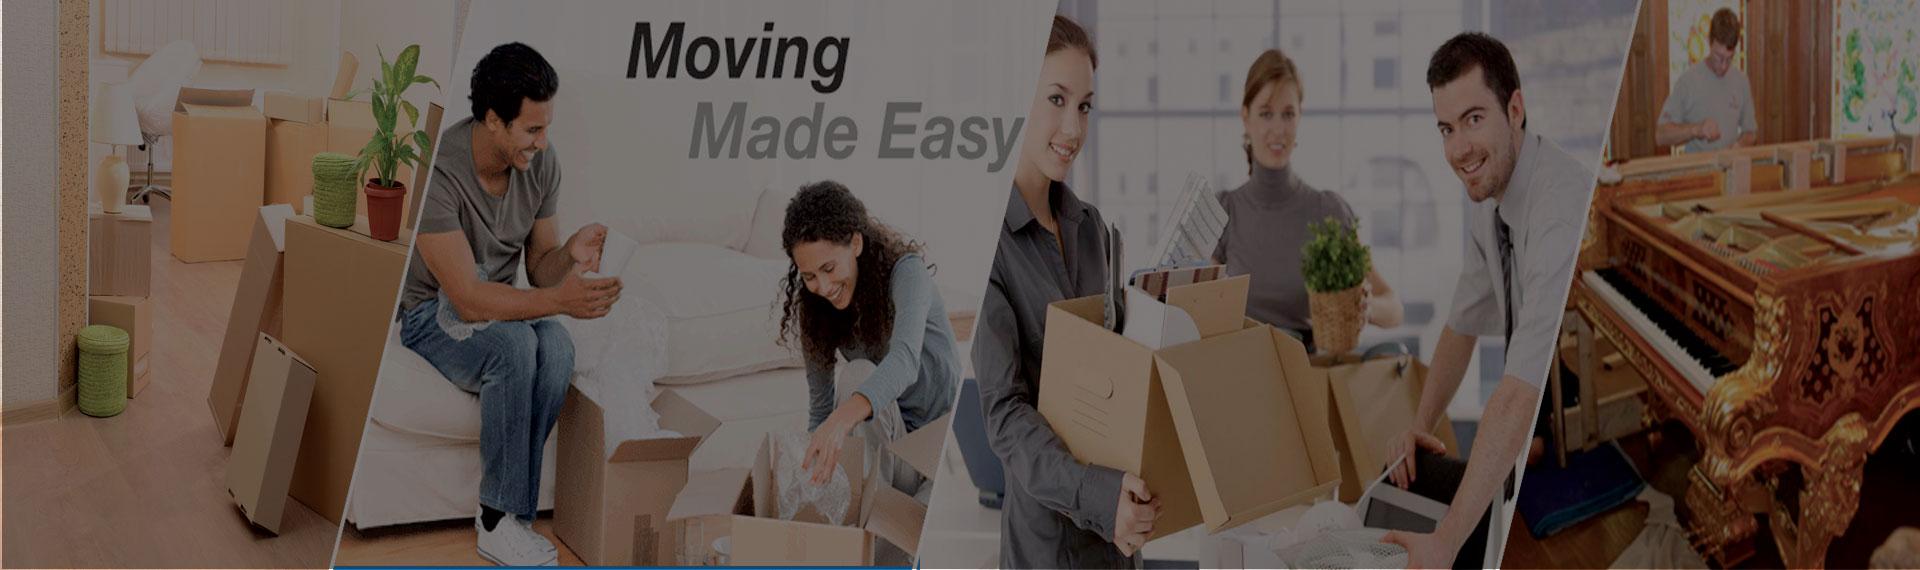 JV Moving Corp Staten Island NY